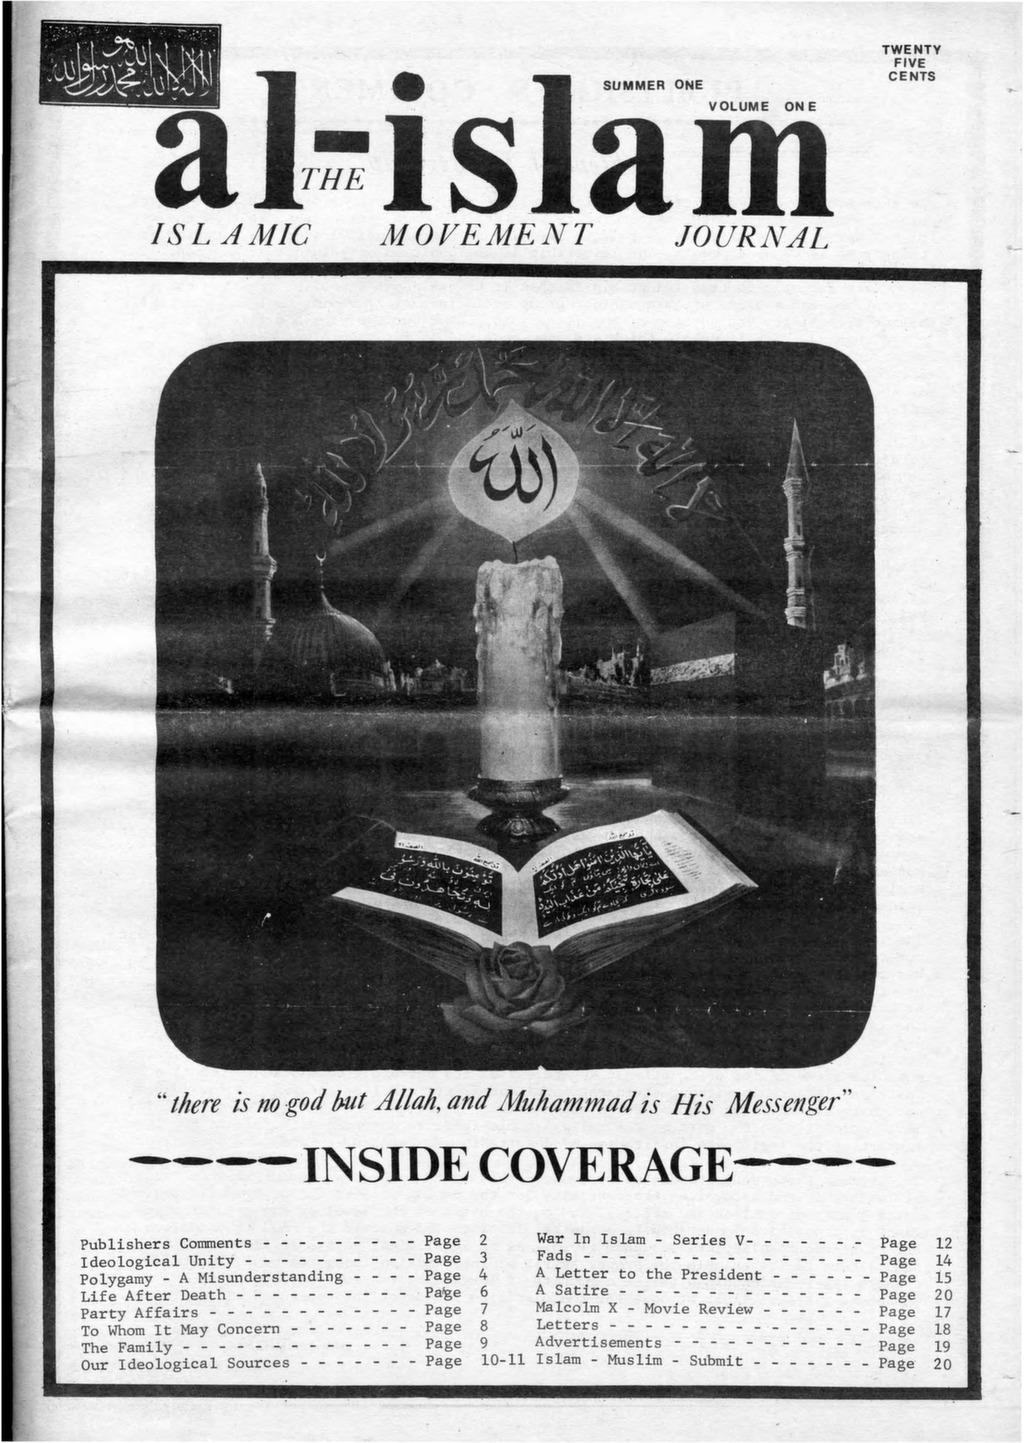 Al Islam 1972 Vol 1 Summer 1 After Malcolm